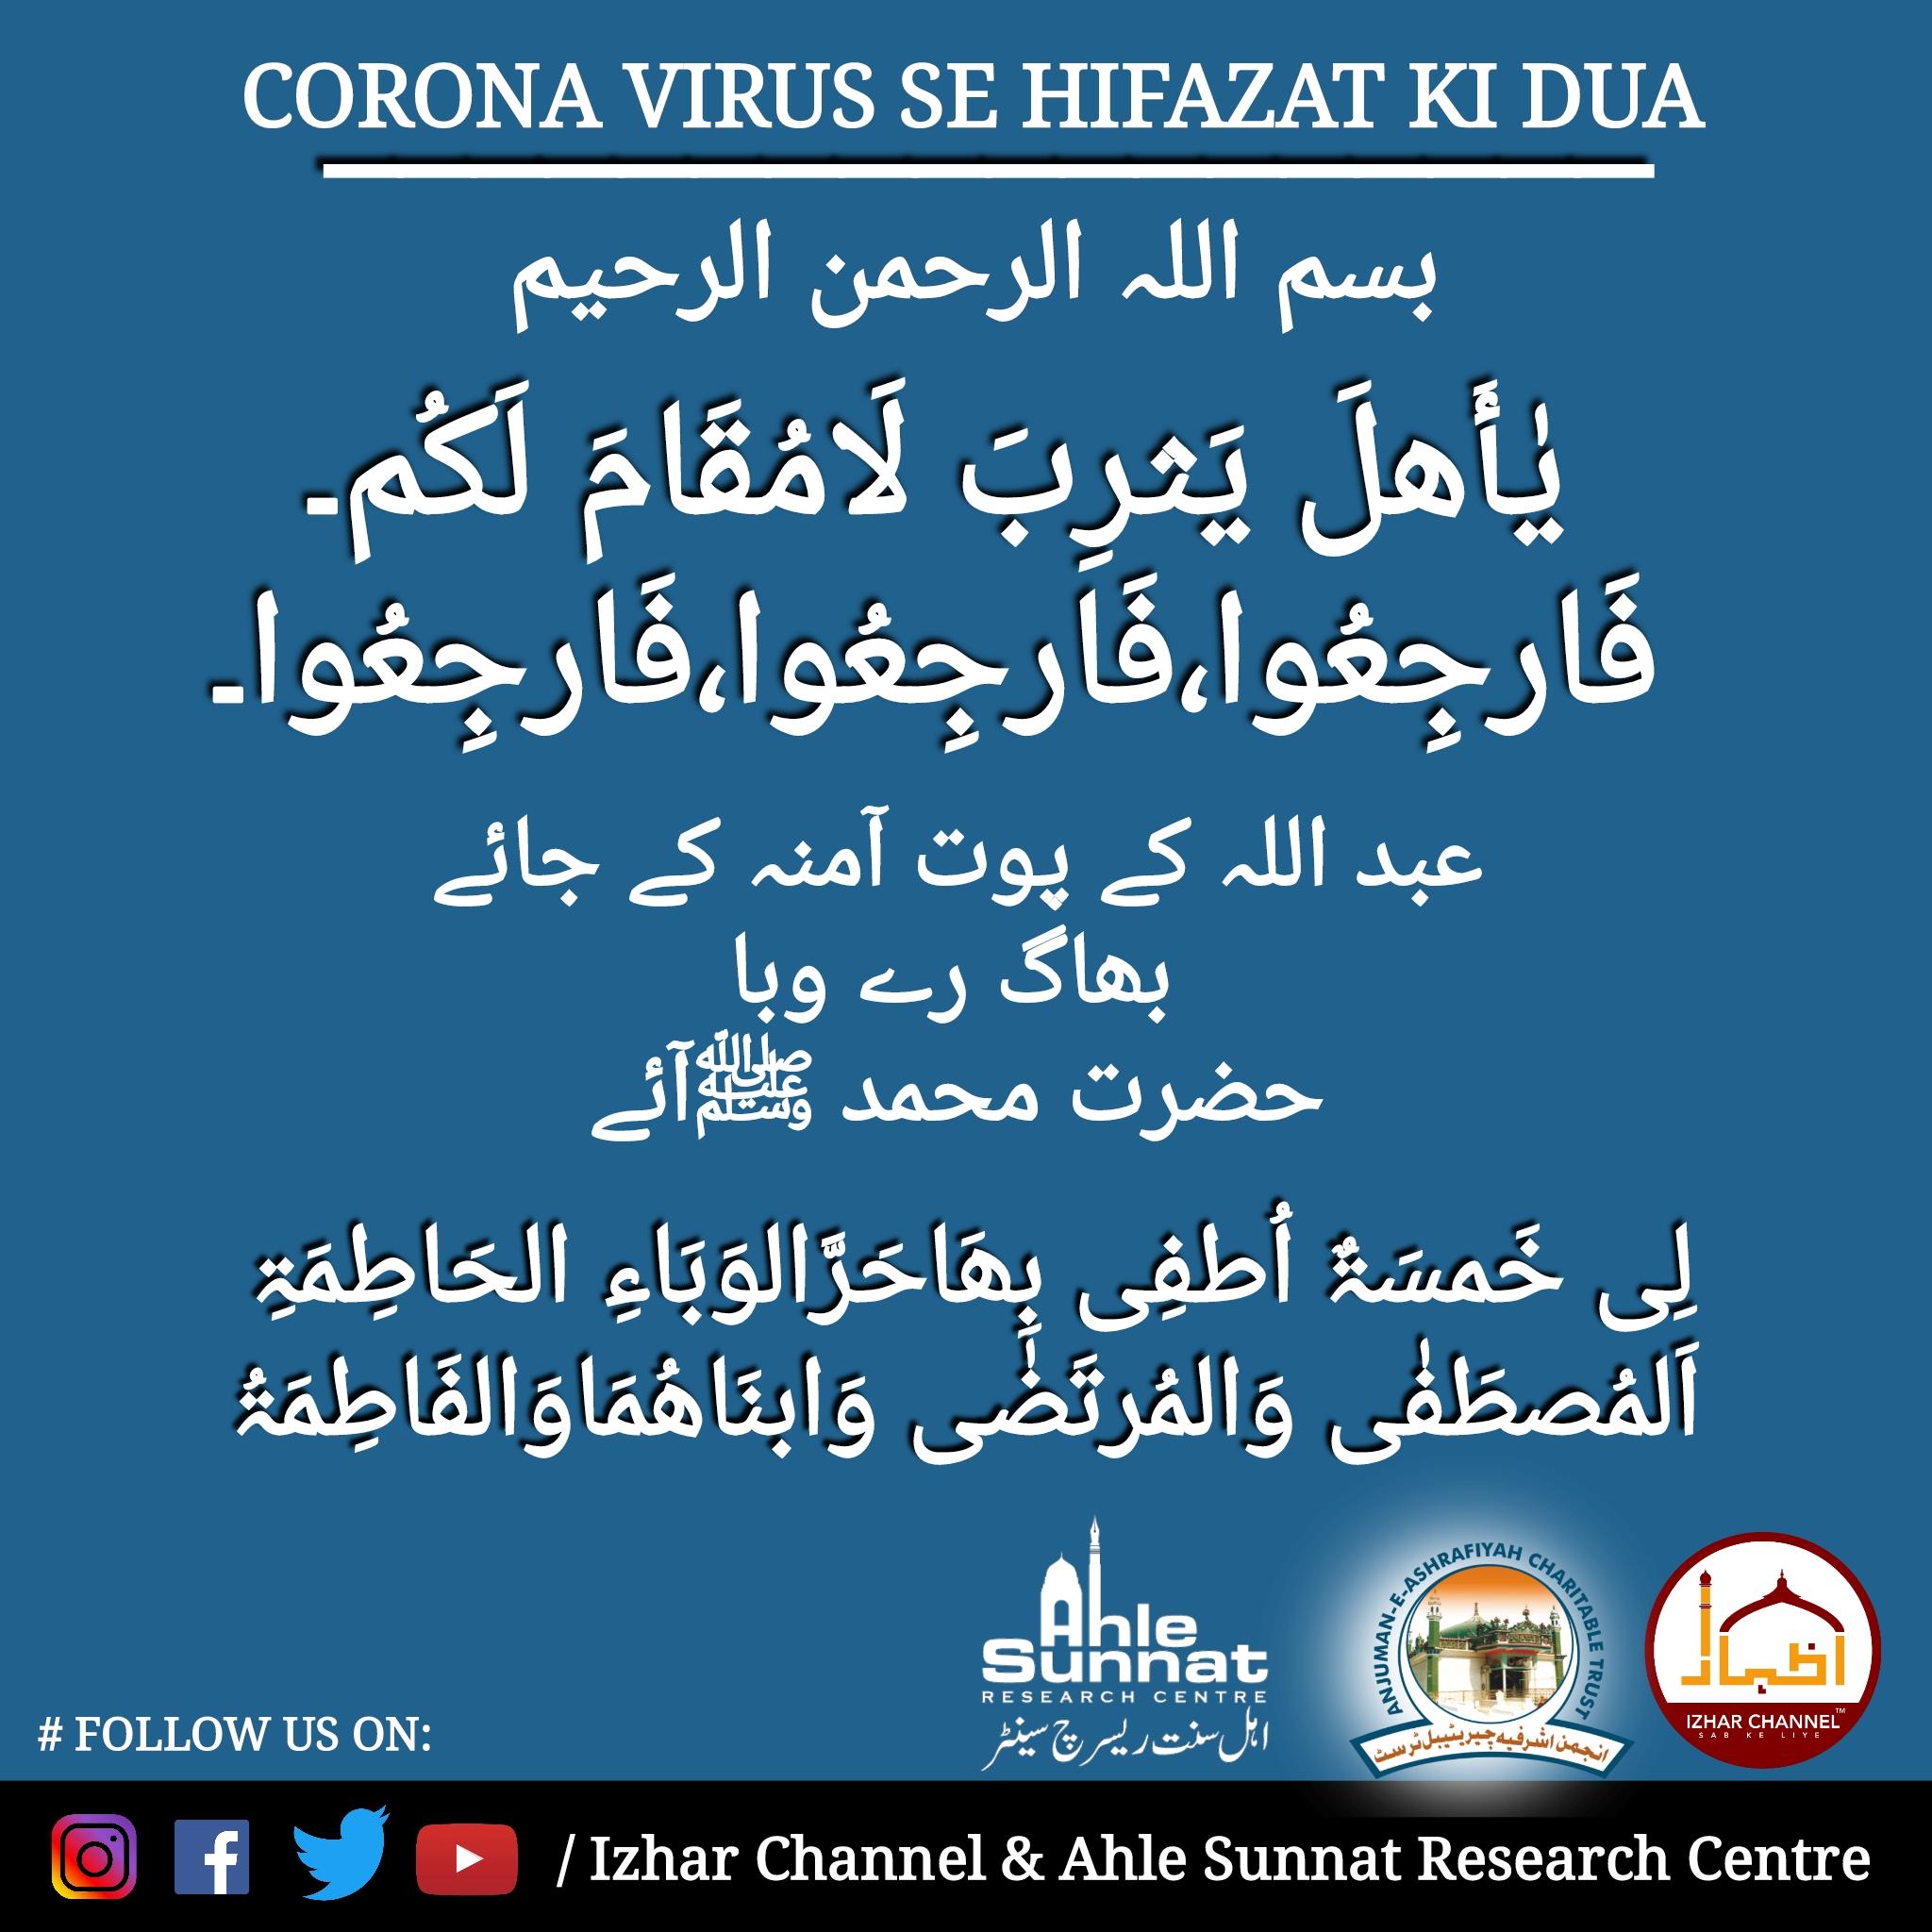 Duaa for Safety from Corona Virus